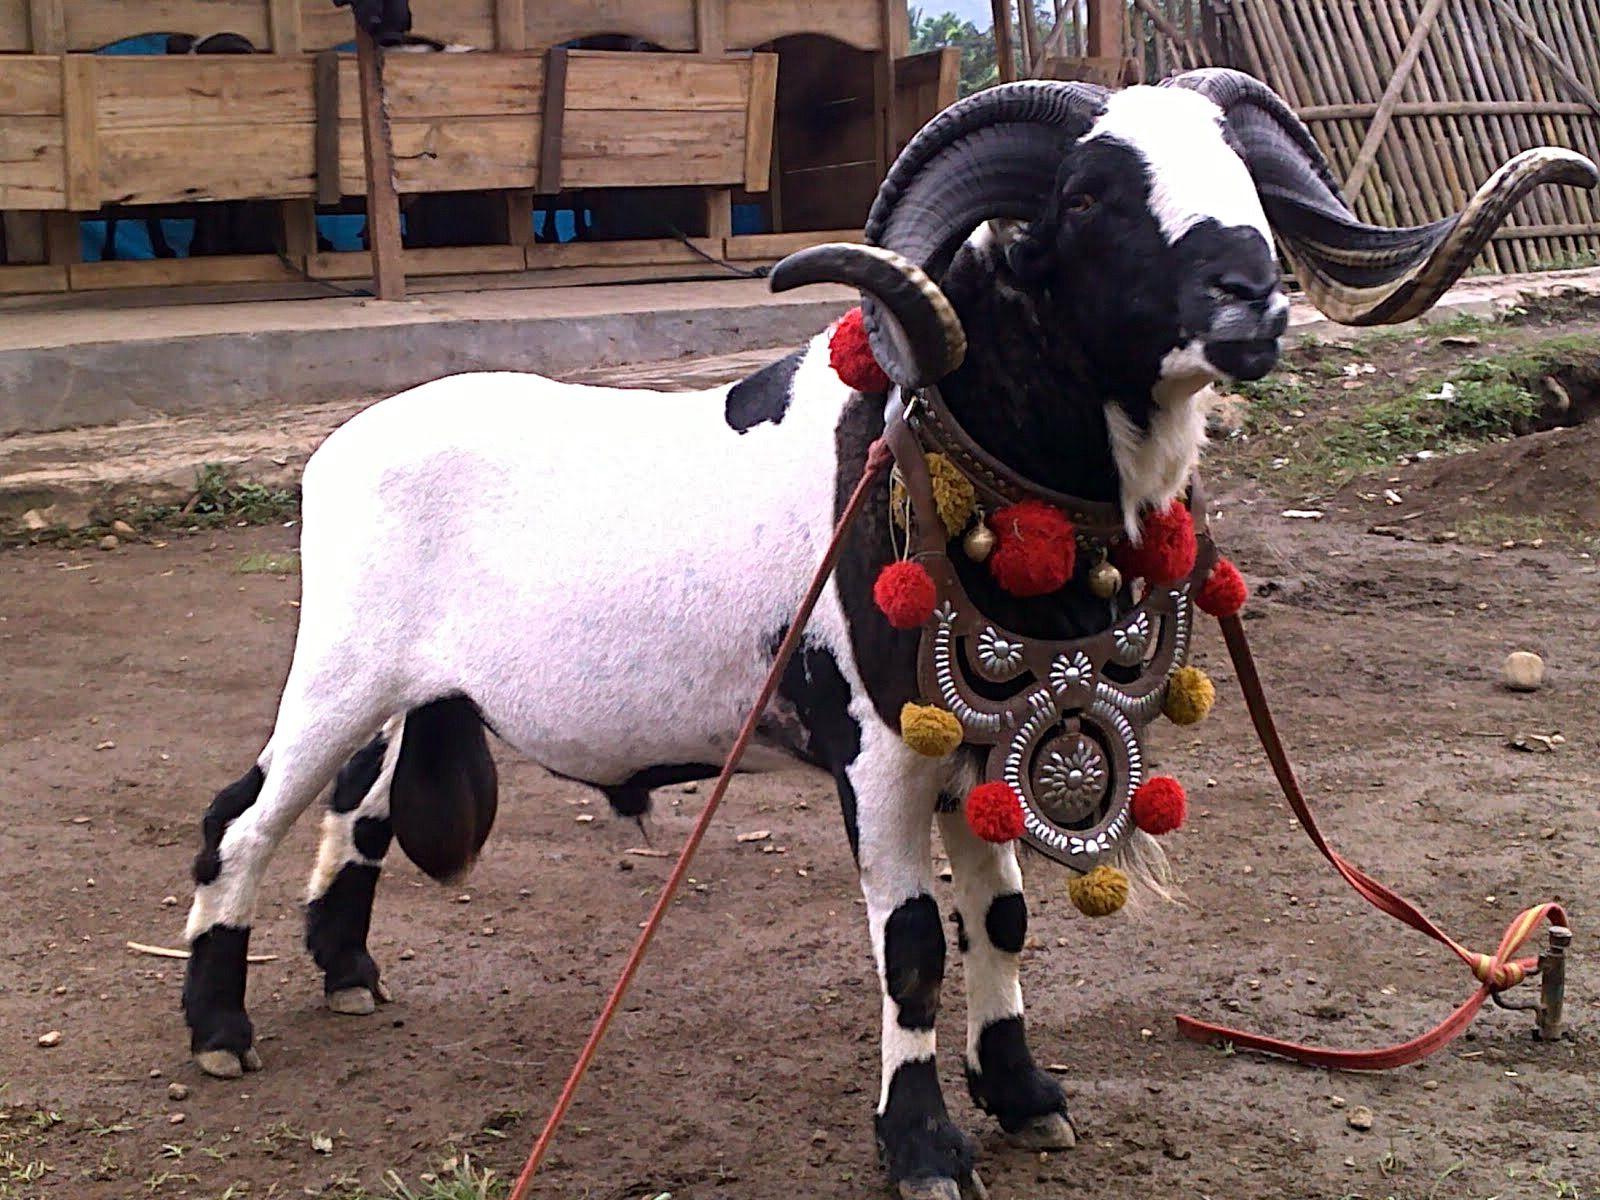 10+ Ide Domba Garut | Domba, Kambing, Seni Tradisional inside Gambar Domba Diadu